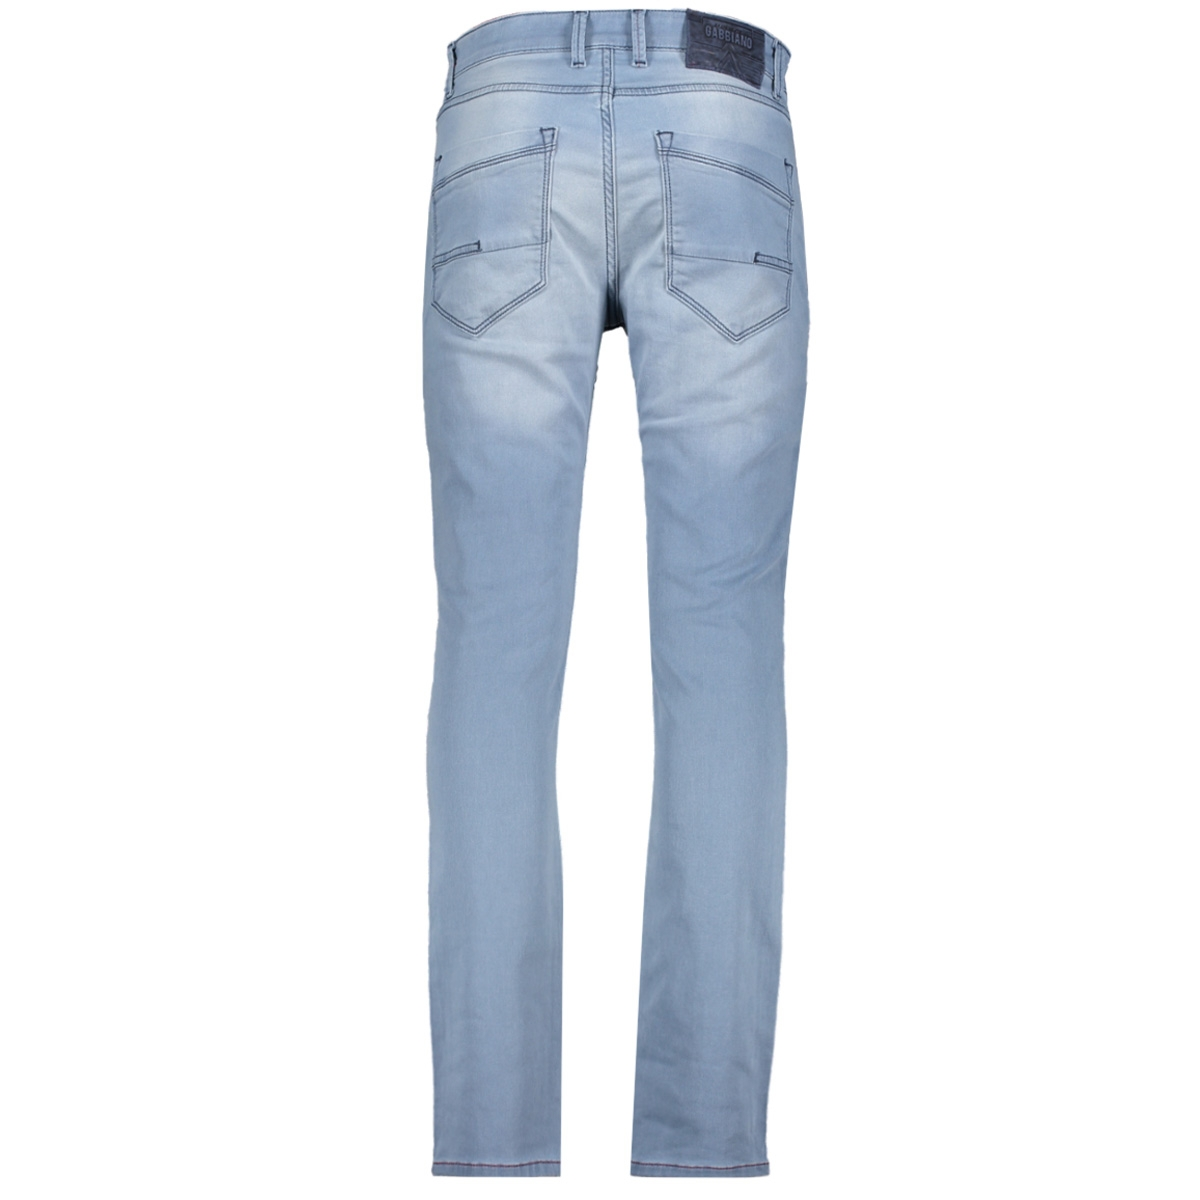 treviso gabbiano jeans bleach